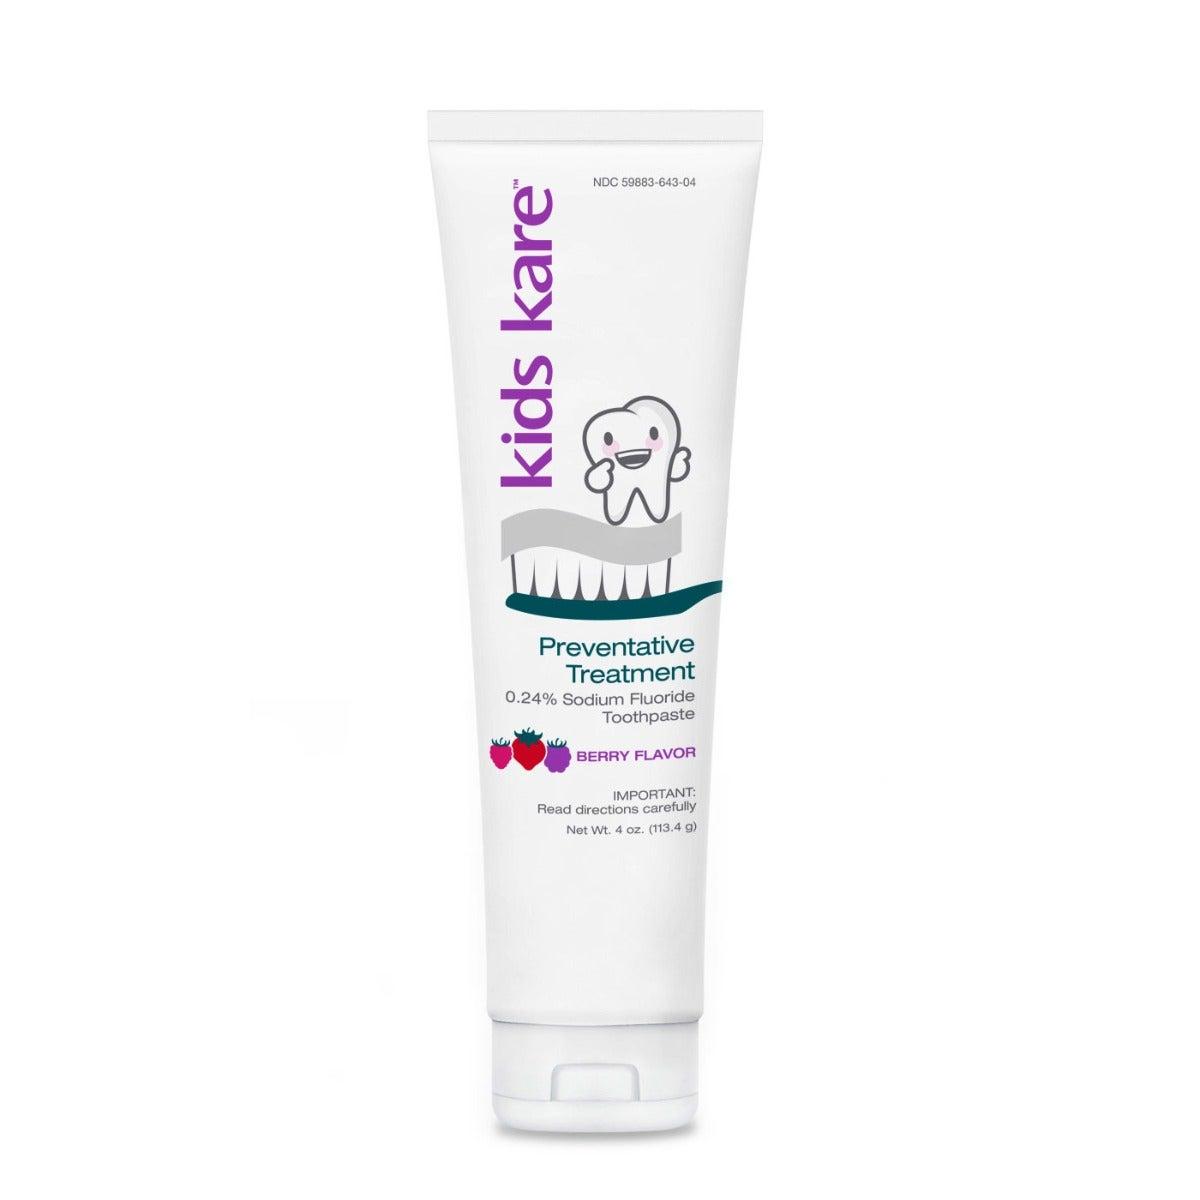 Kids Kare™ 0.24% Neutral Sodium Fluoride Toothpaste